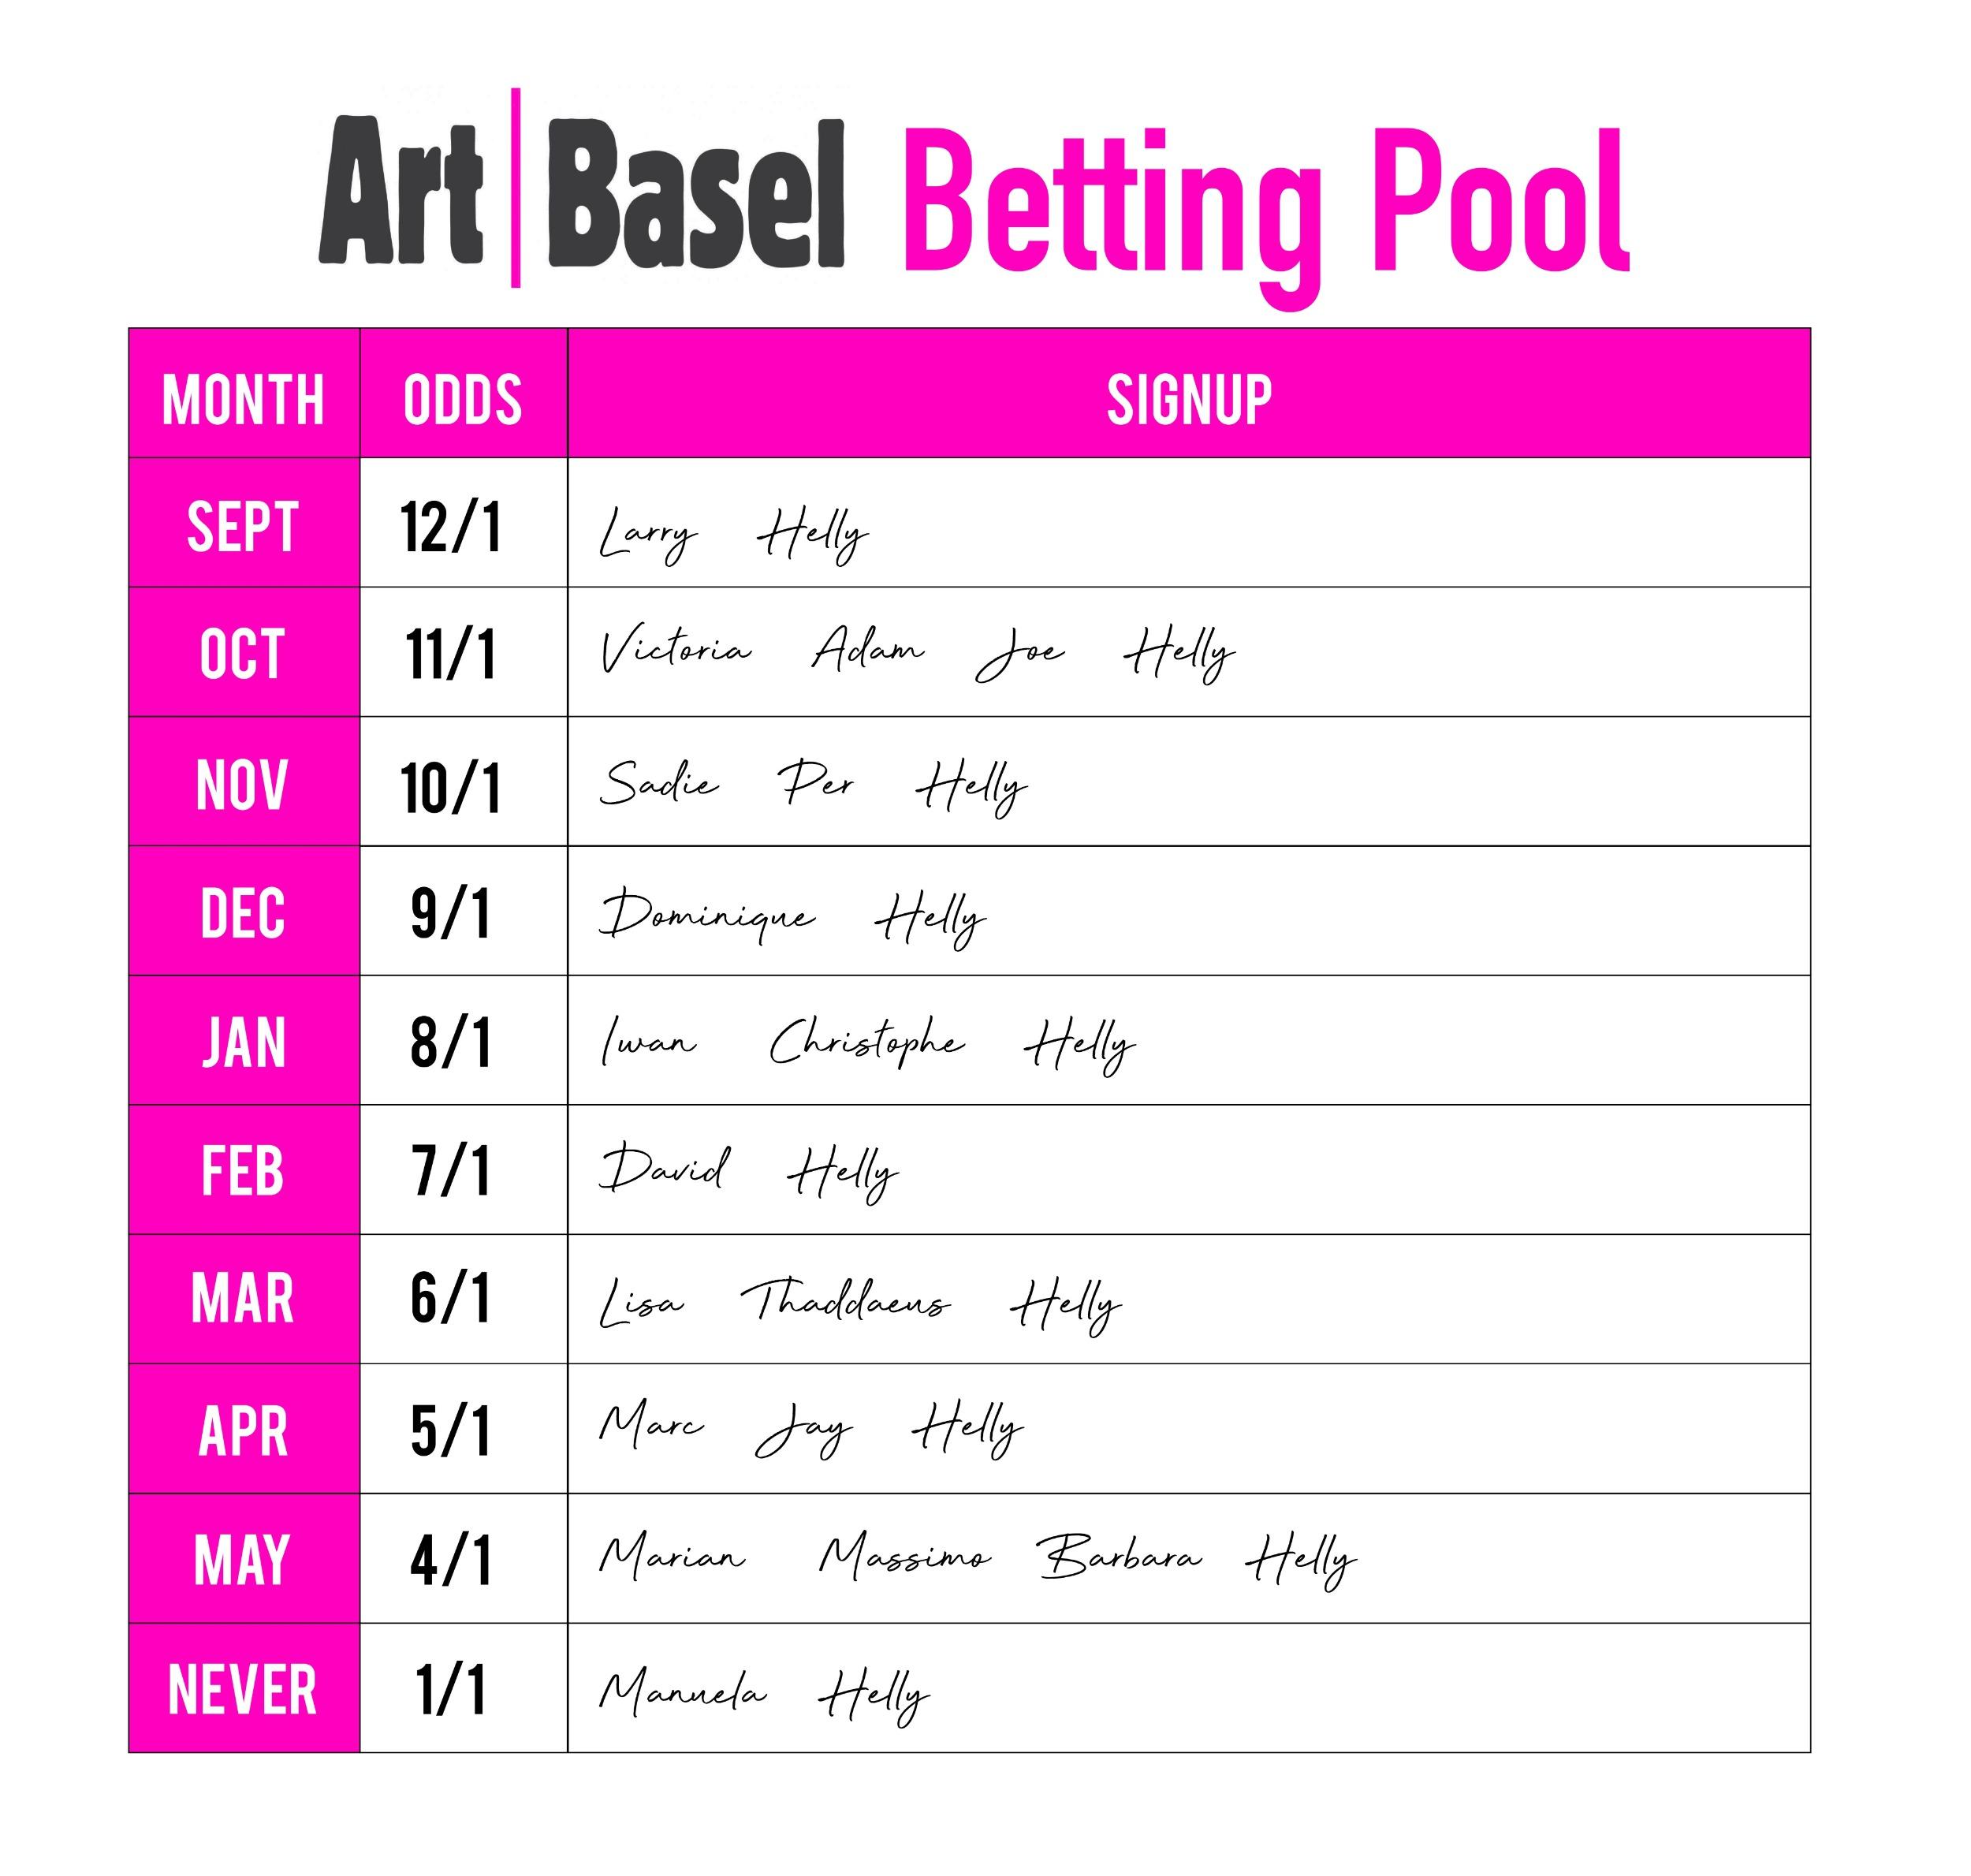 Art Basel Betting Pool